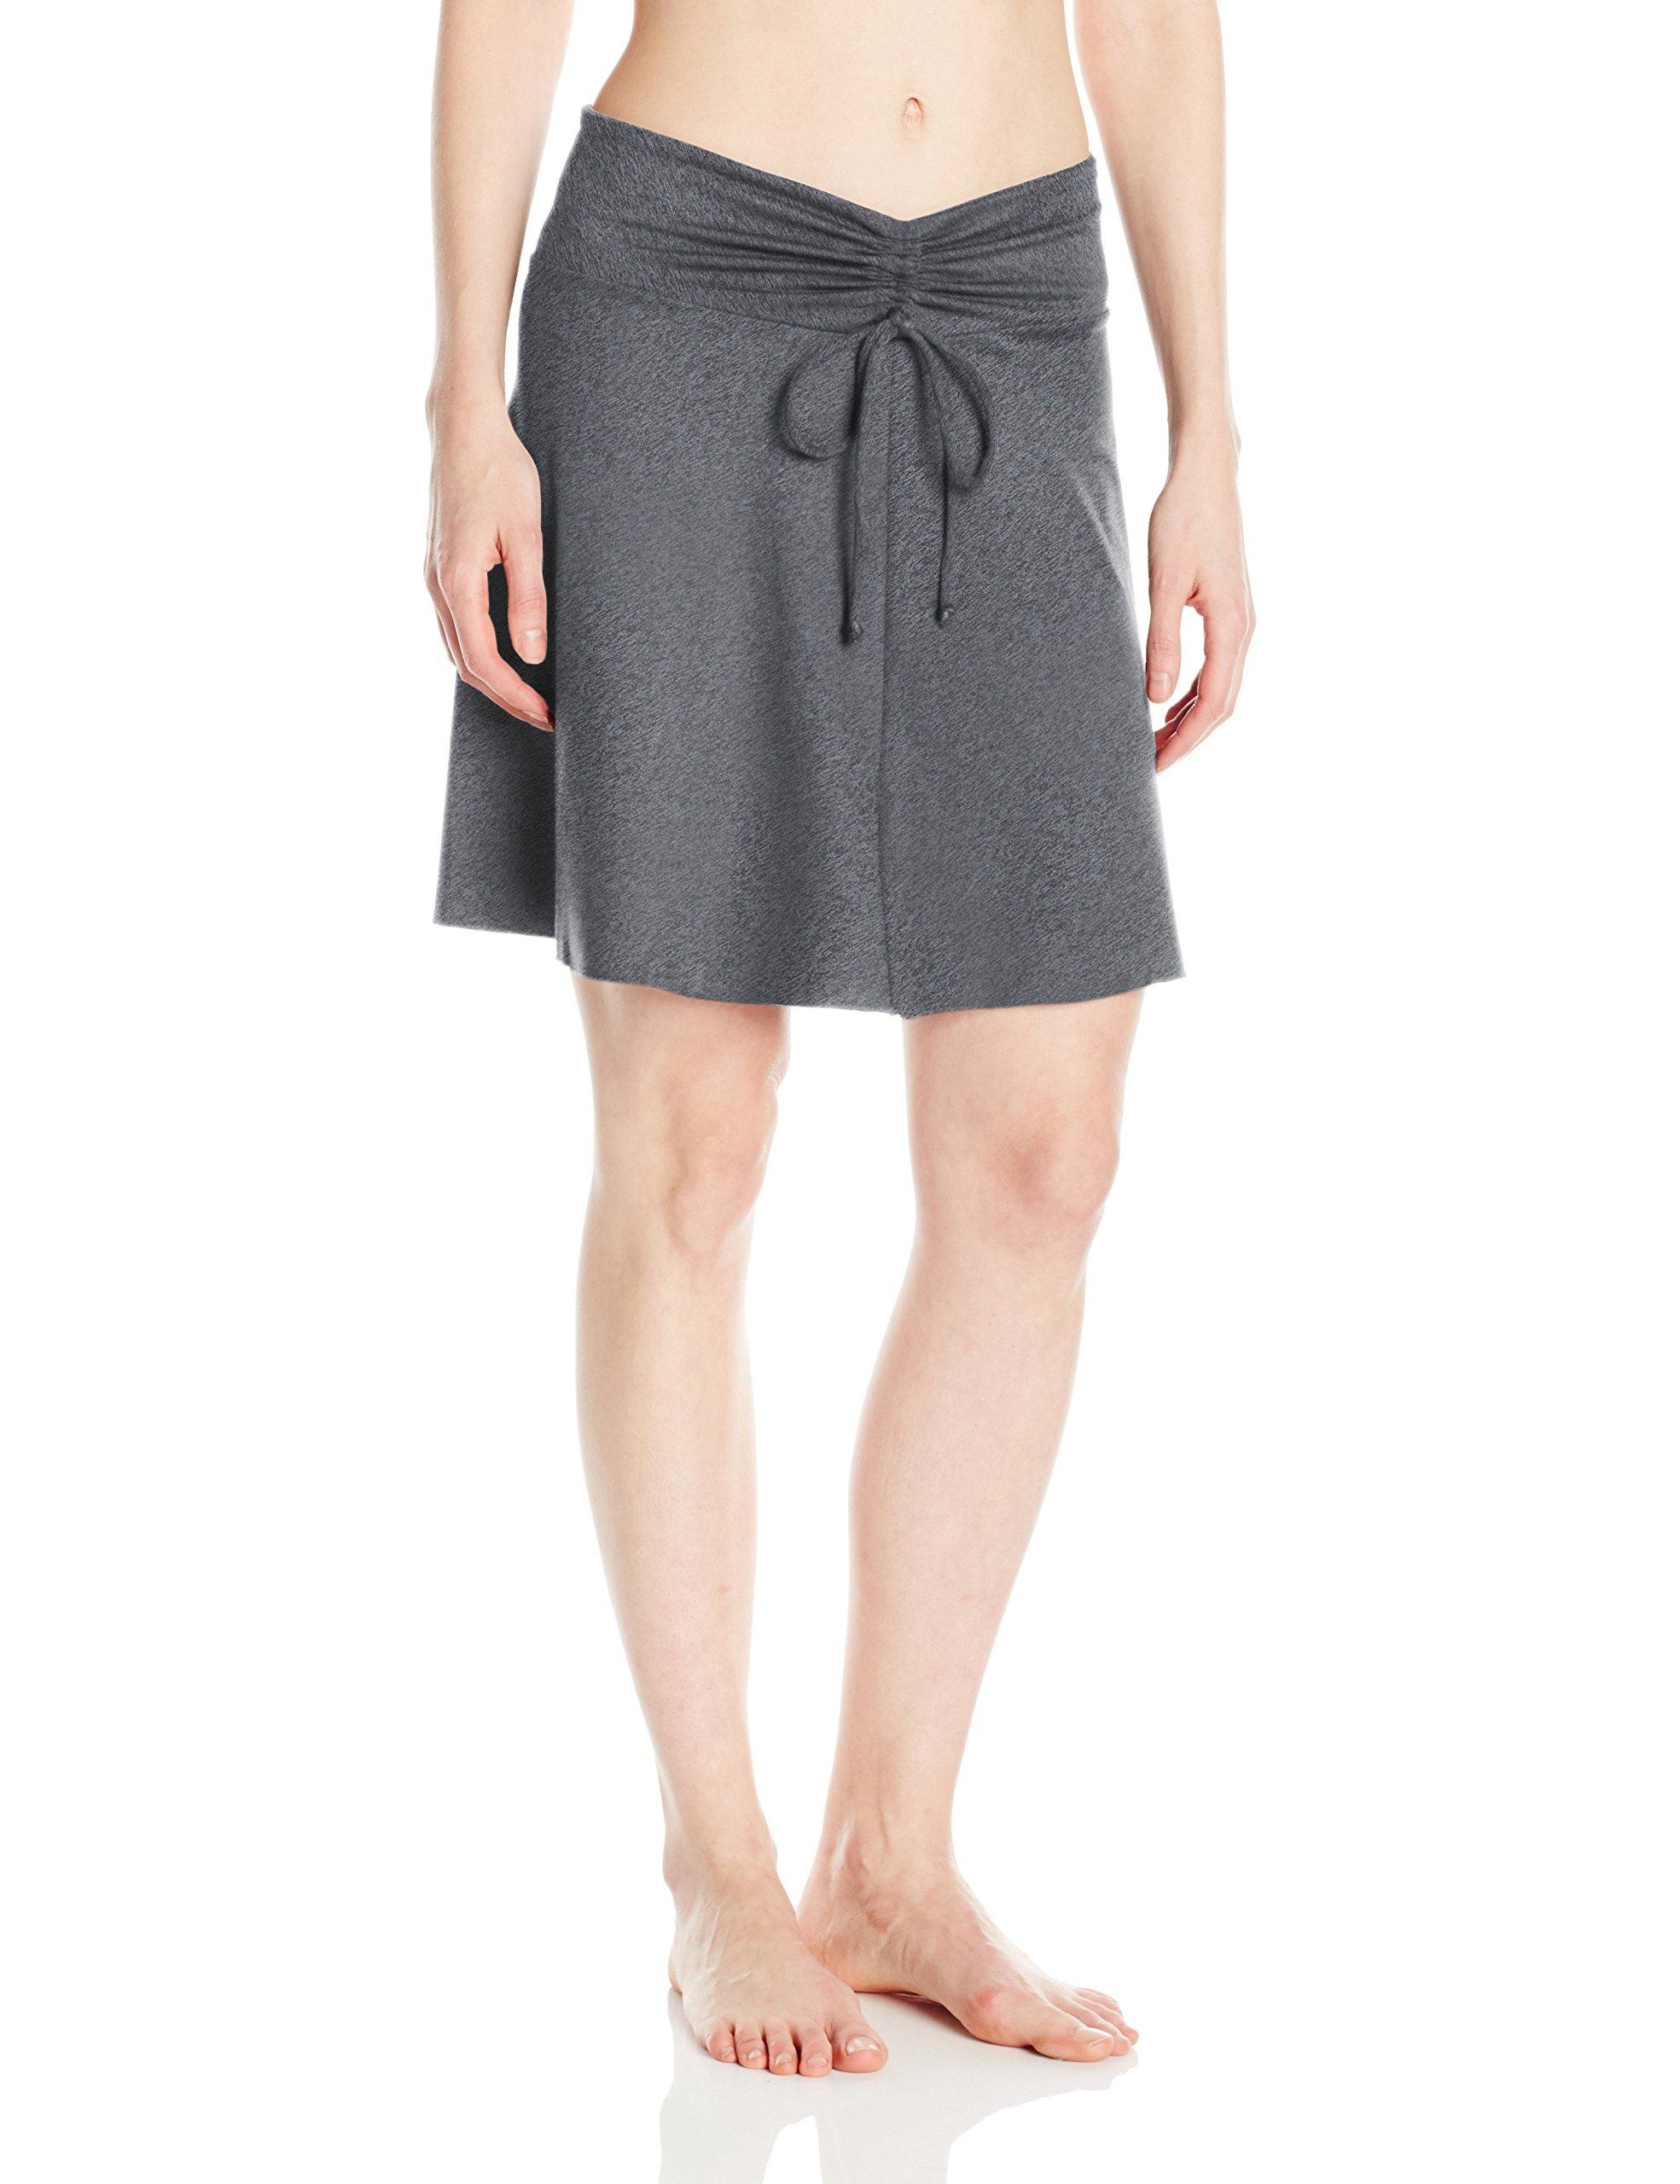 Soybu Women's Serendipity Skirt, Medium, Storm Heather by Soybu